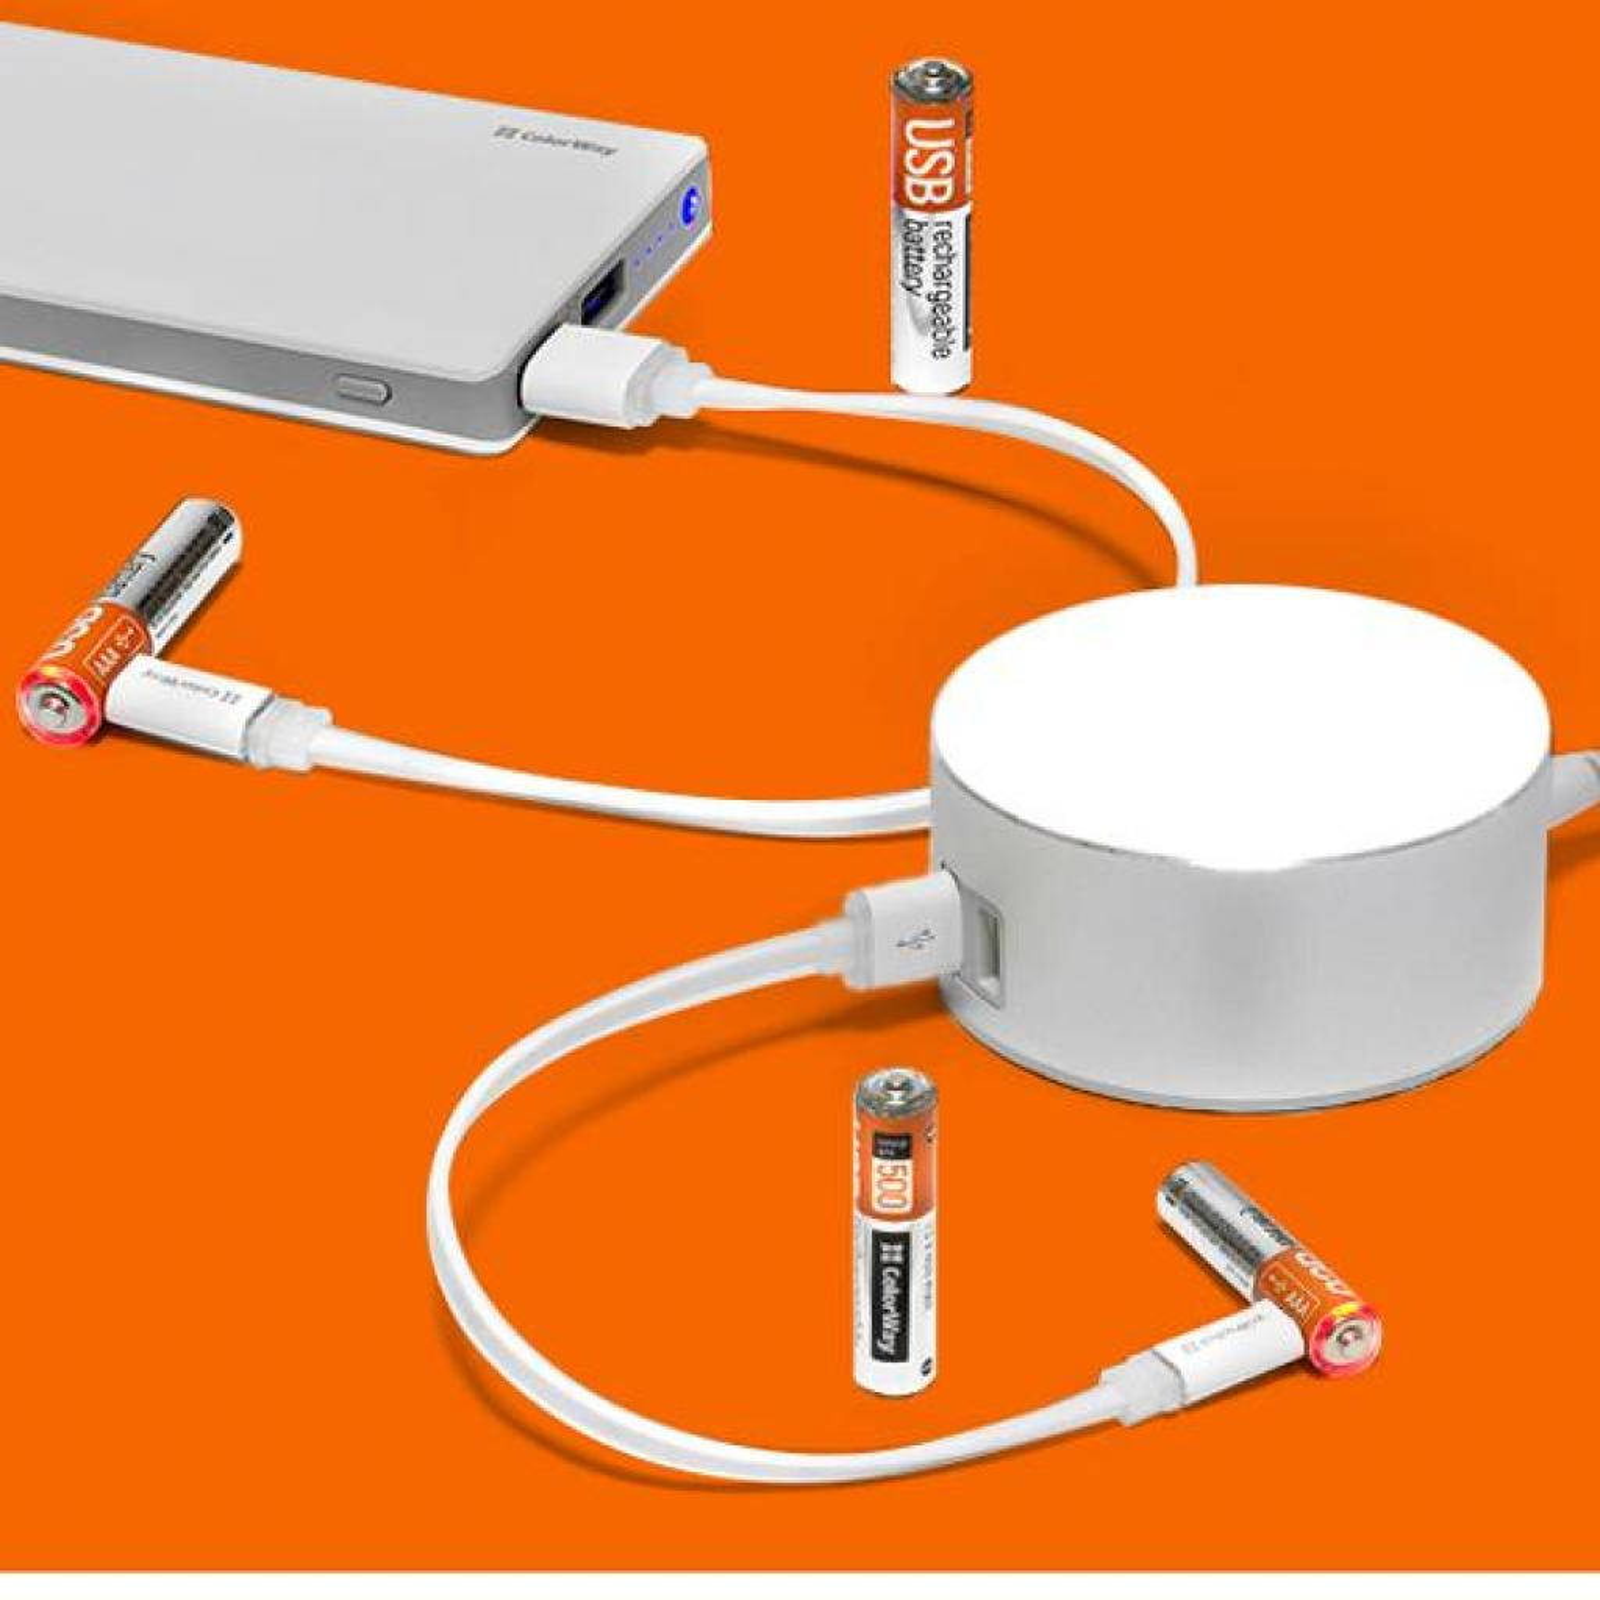 Аккумулятор ColorWay AAA micro USB 400 mAh * 2 (CW-UBAAA-01) изображение 5